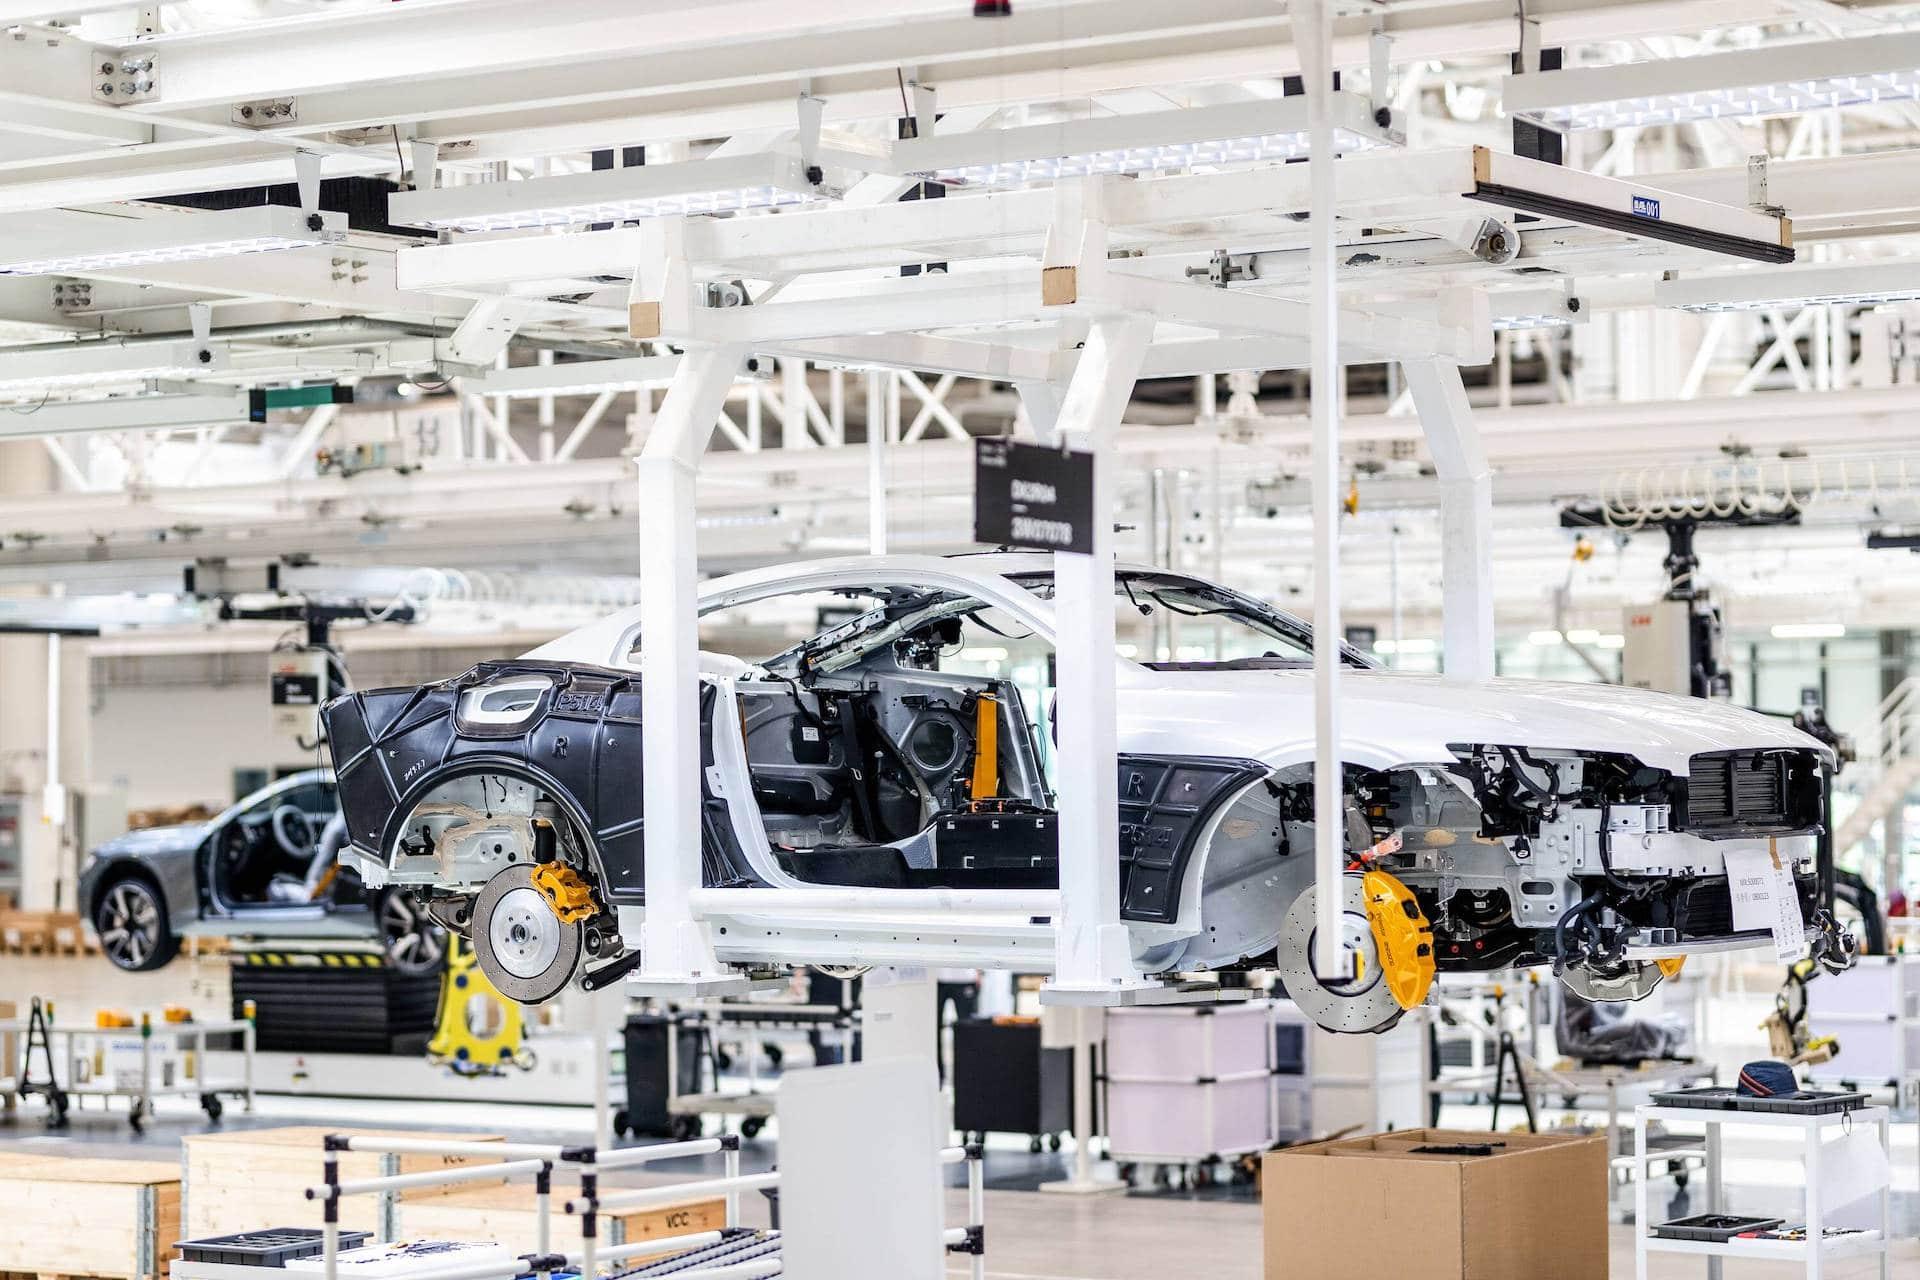 Polestar-Elektroauto-Fertigung-China-Produktion